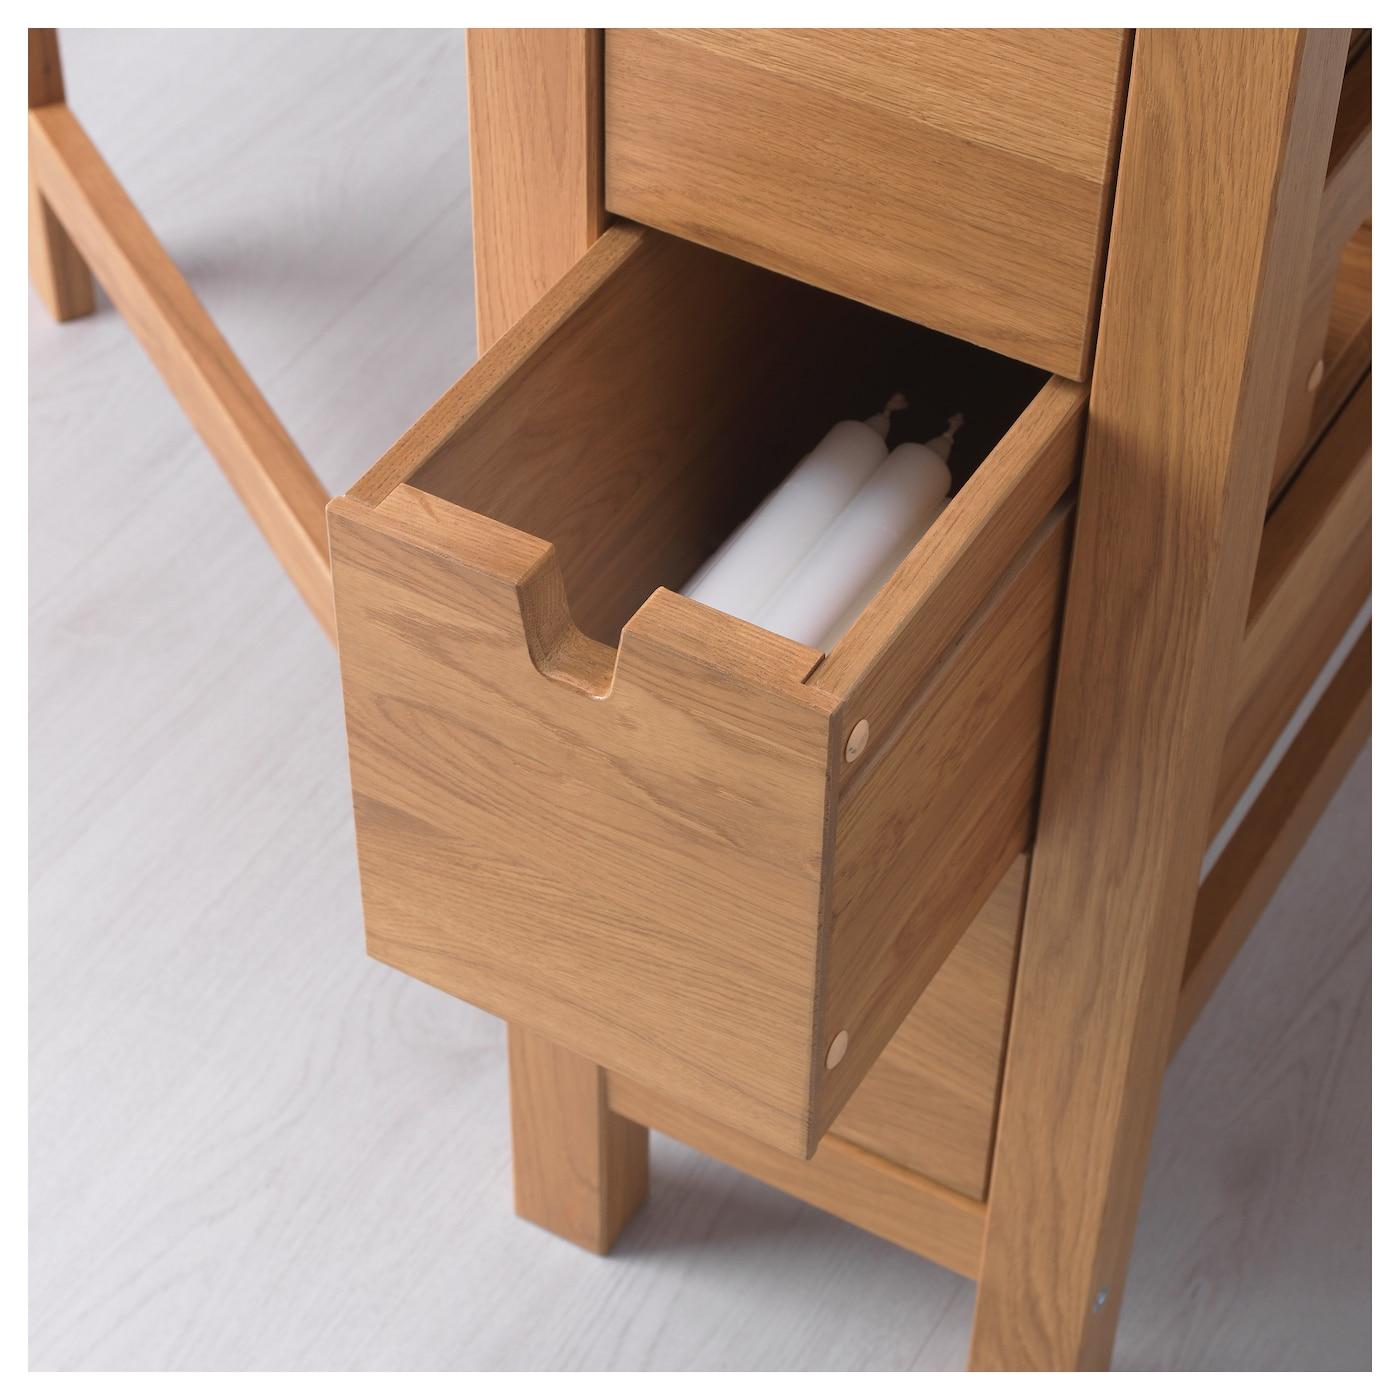 Ikea norden gateleg table solid wood is a hardwearing natural material - Norden Gateleg Table Oak 26 89 152x80 Cm Ikea